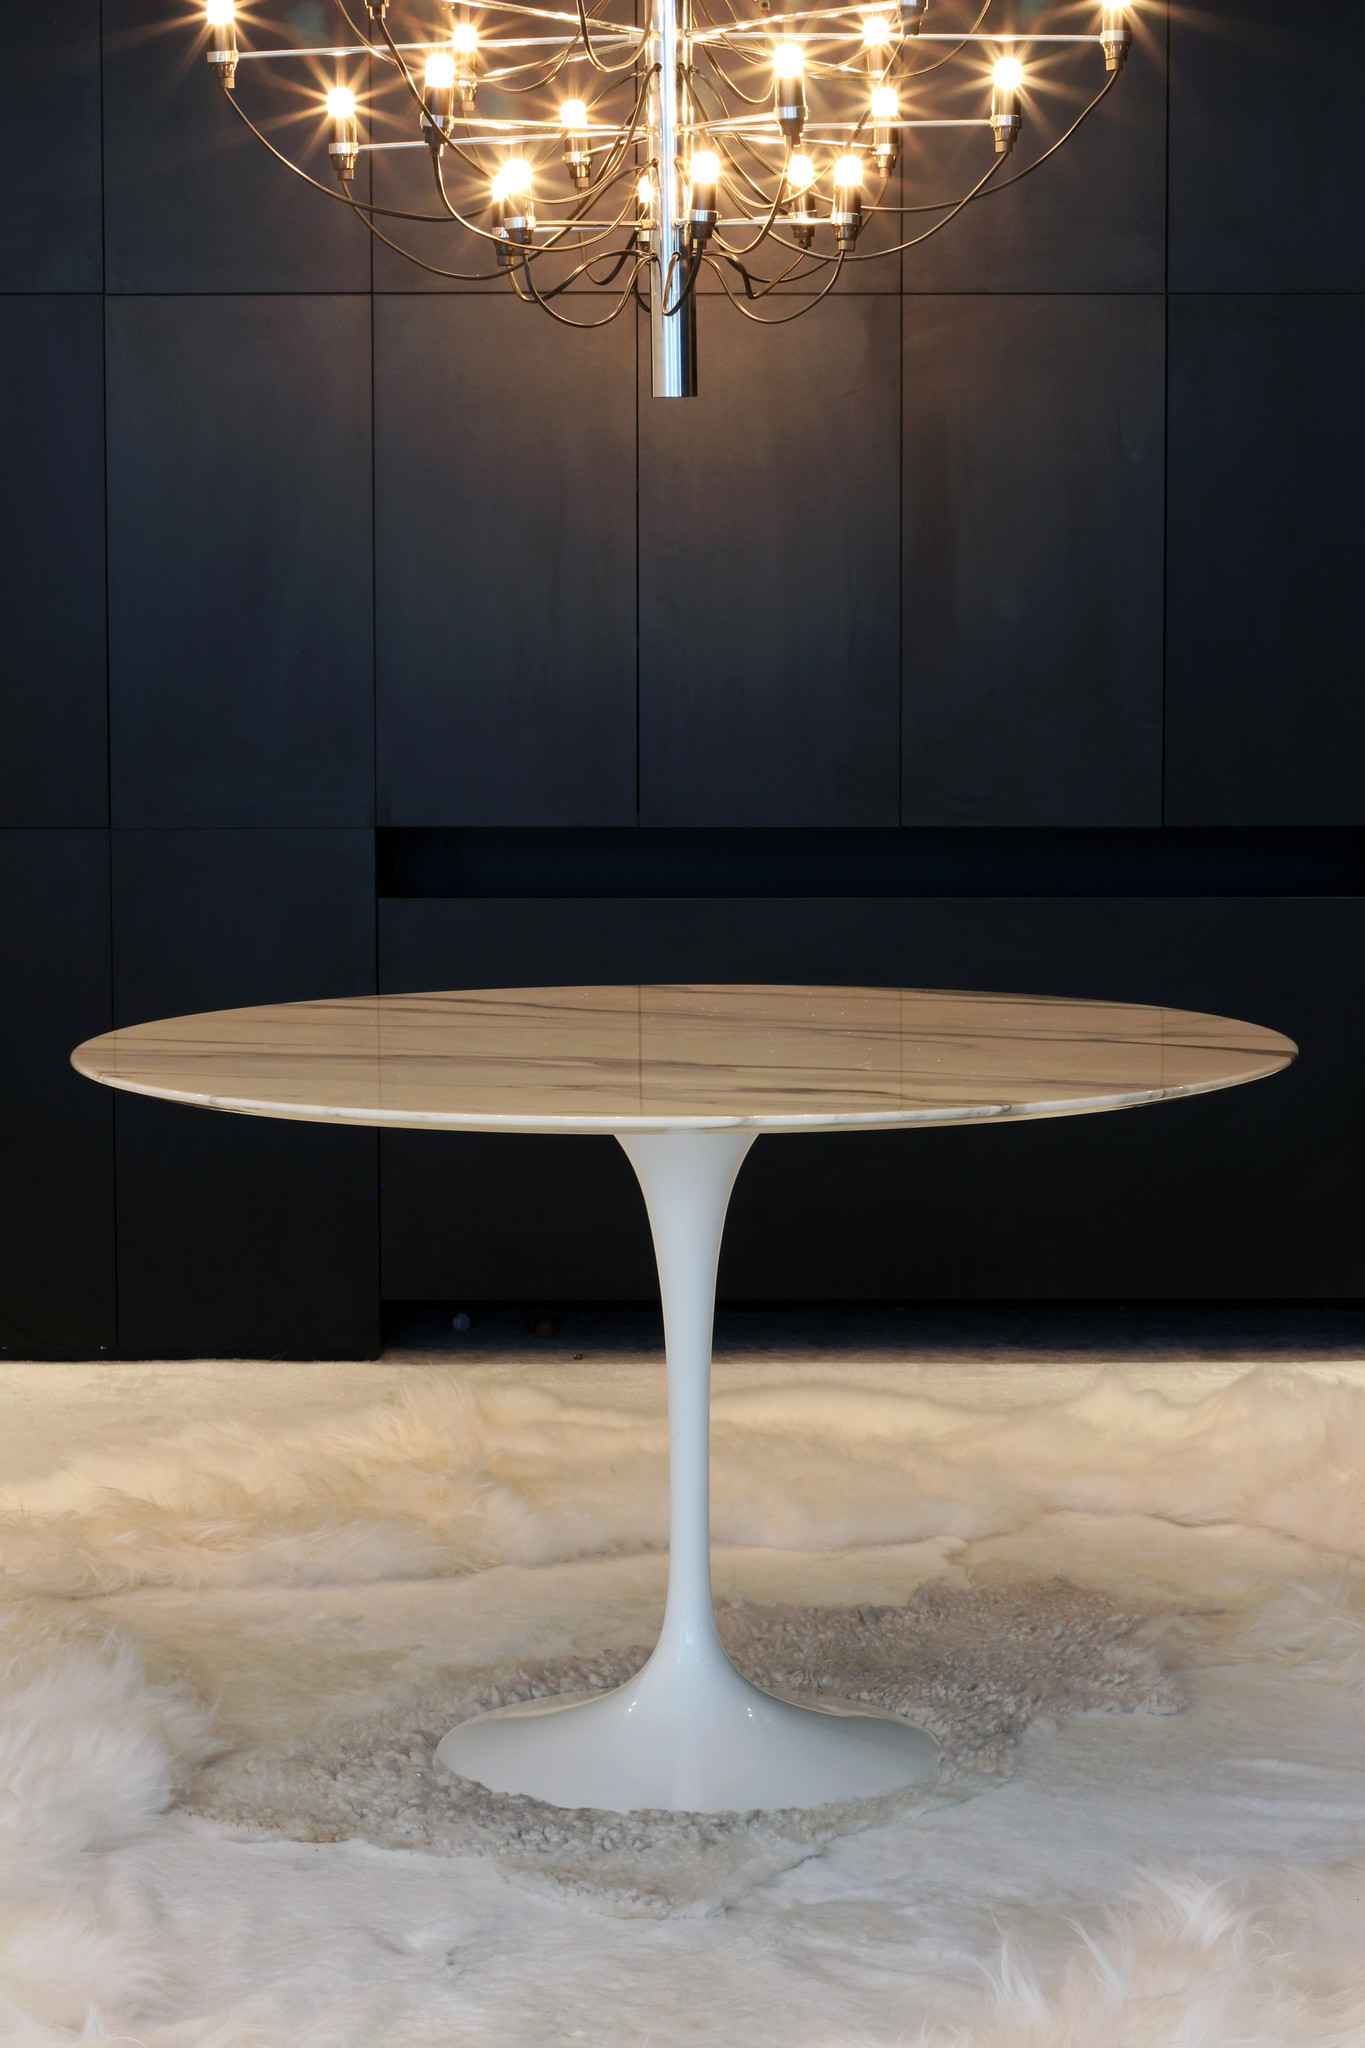 Knoll dining table by Eero Saarinen for Knoll International